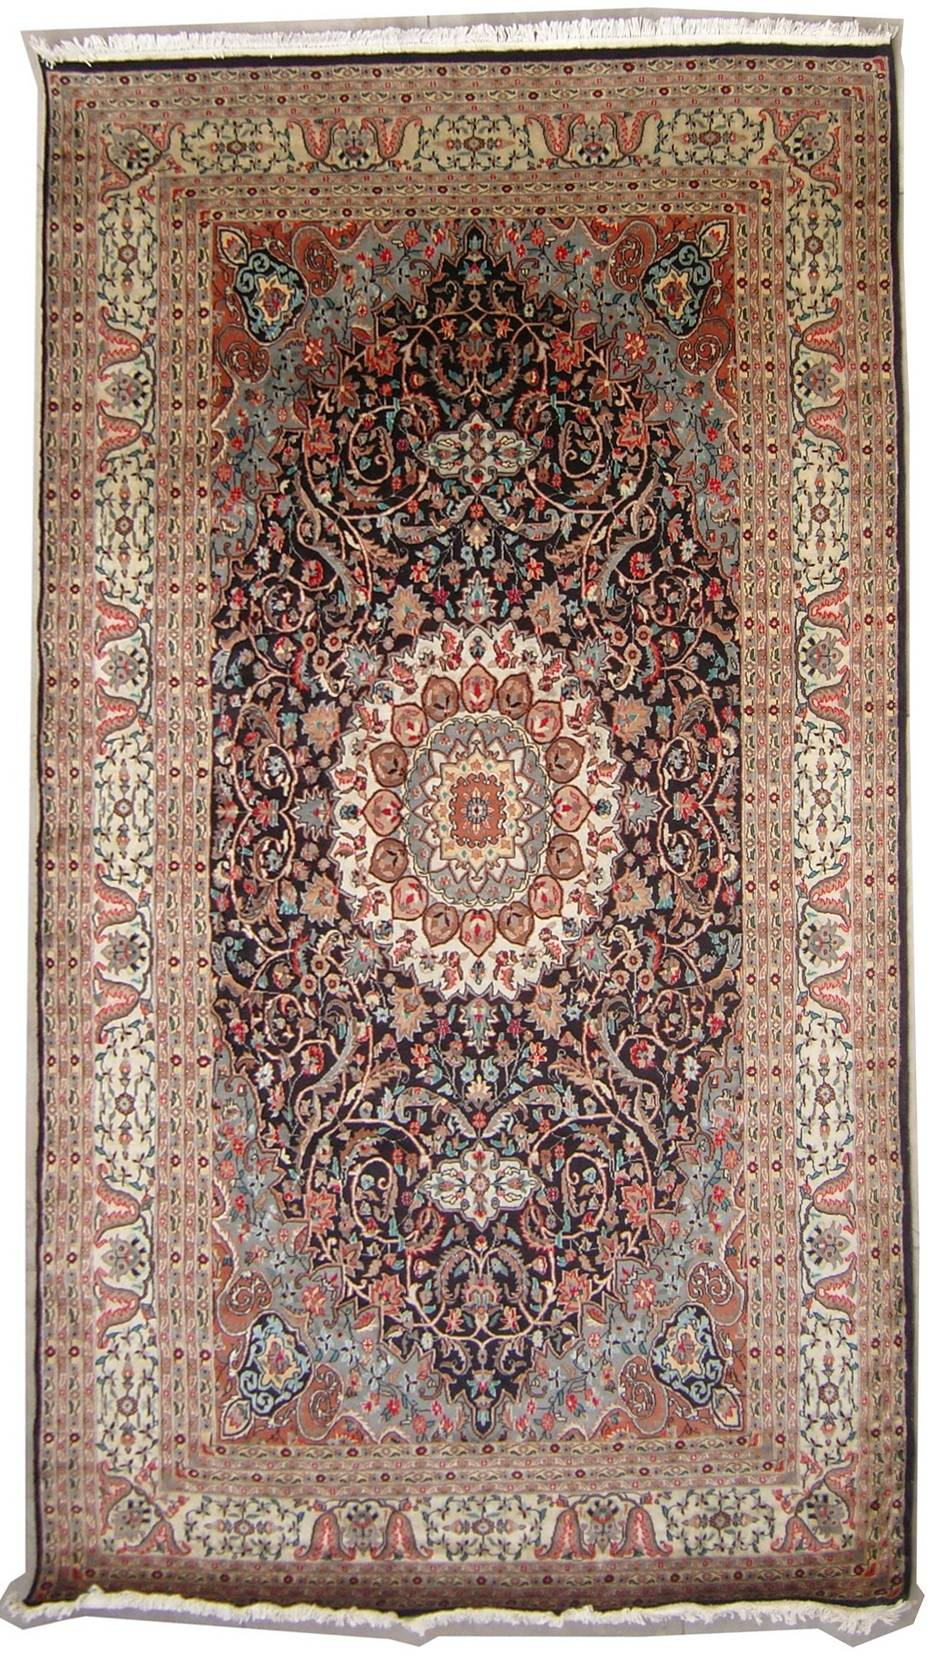 7 39 10x12 39 0 Rug Double Knot Pak Persian Ispahan Design